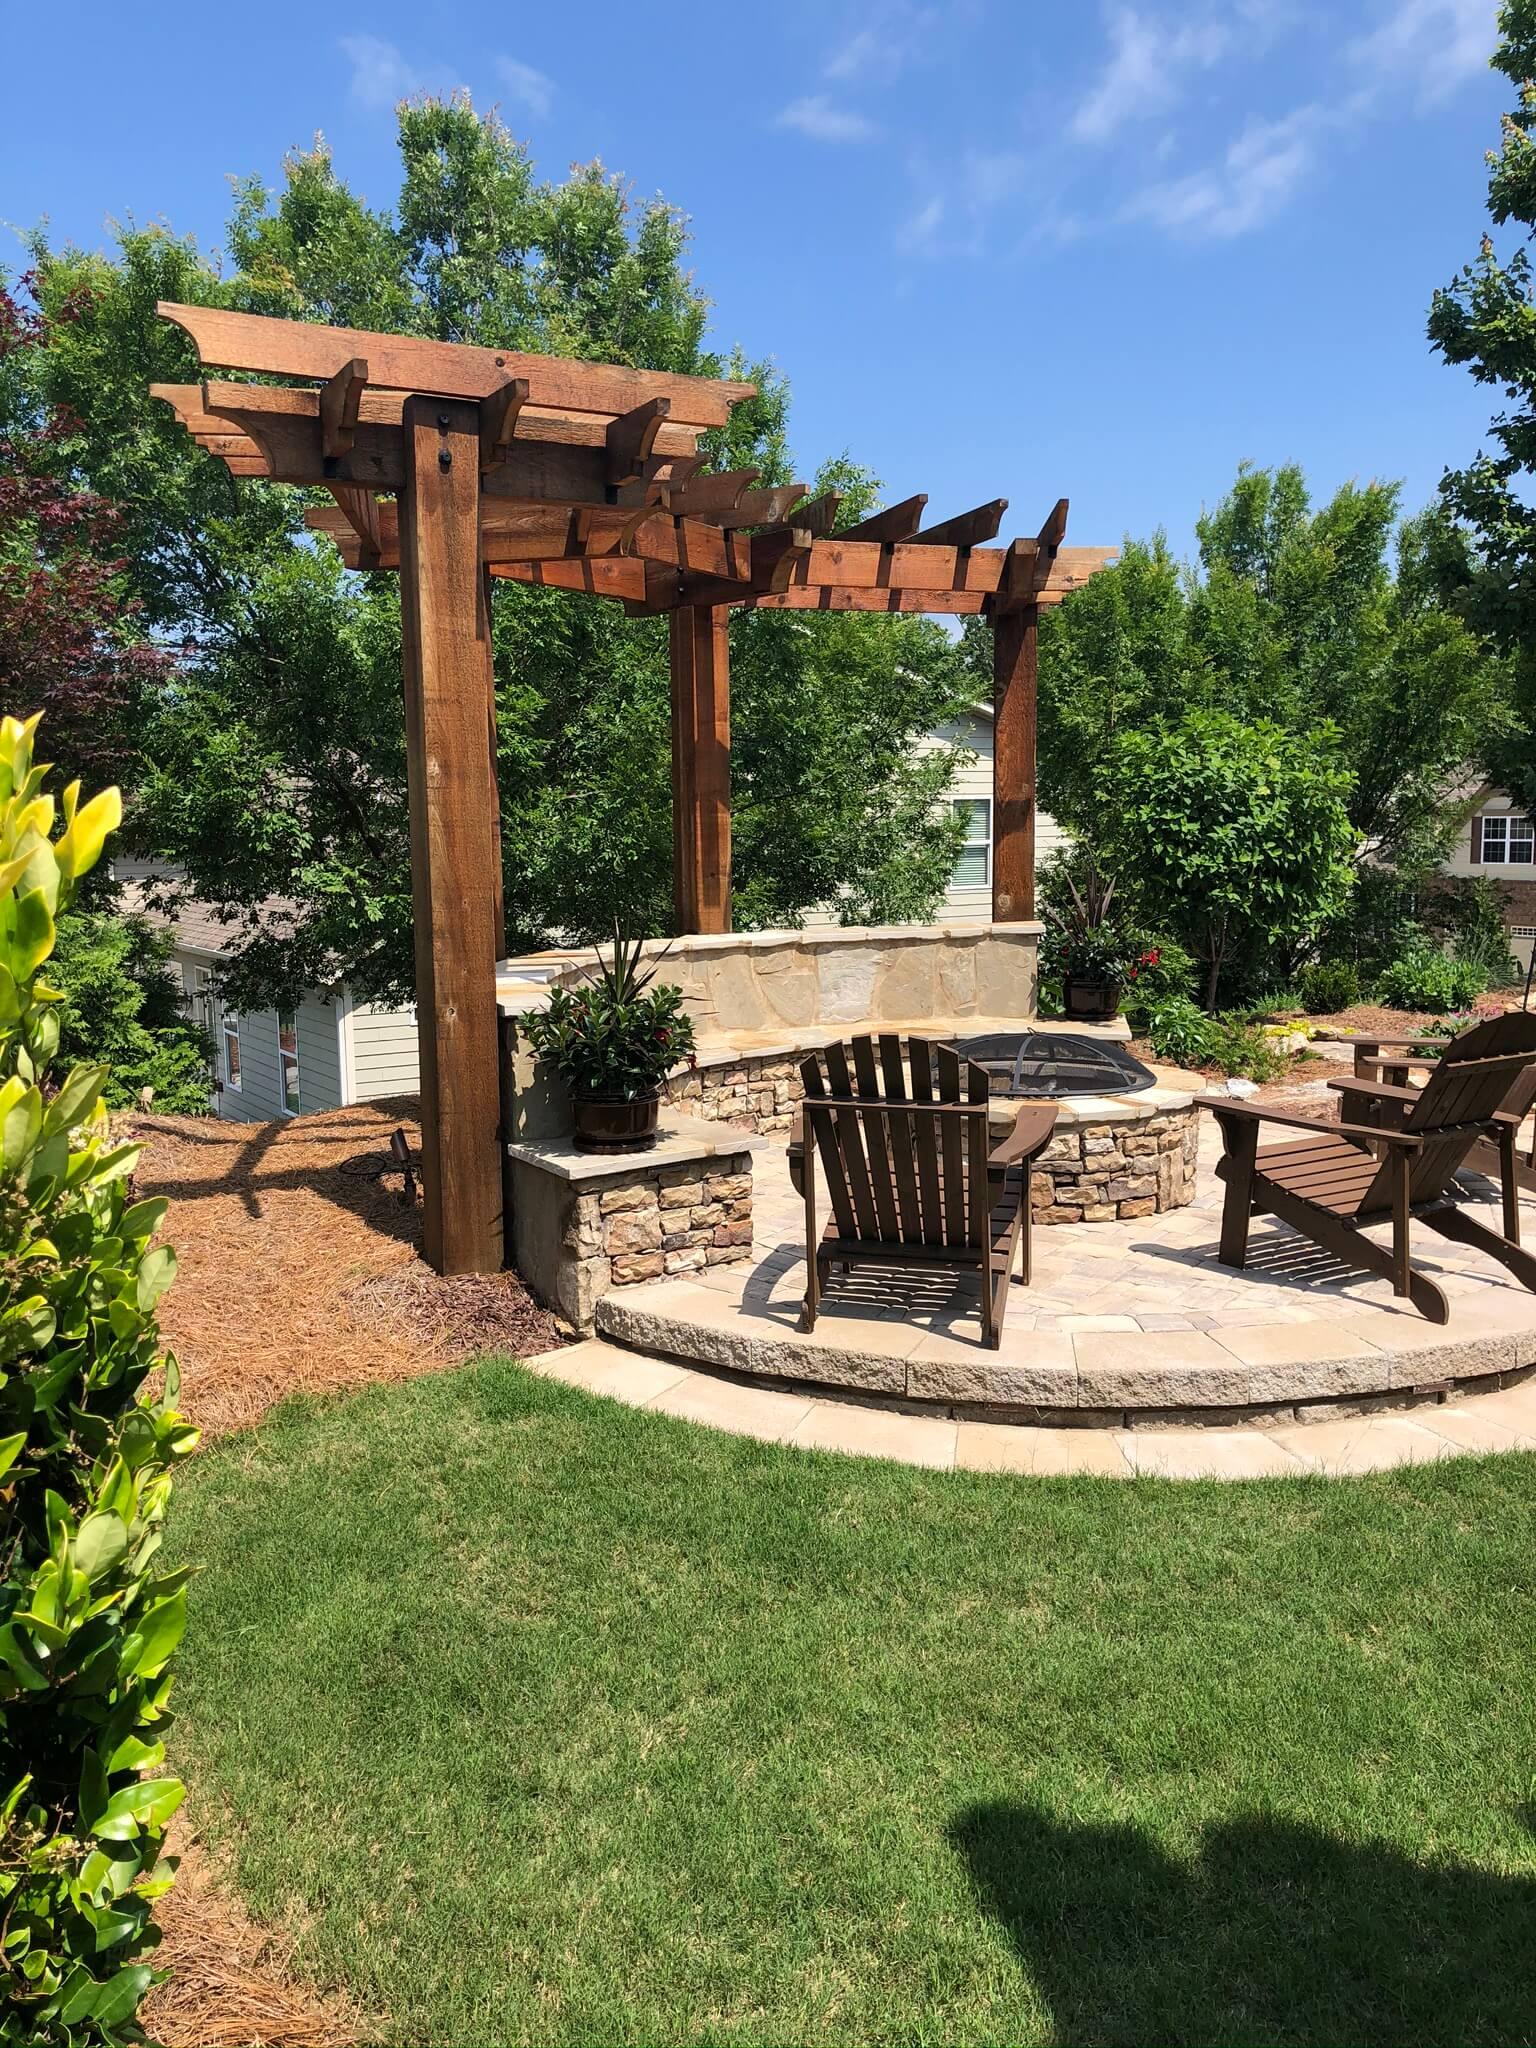 Buford & Hall County, GA Outdoor Living Design